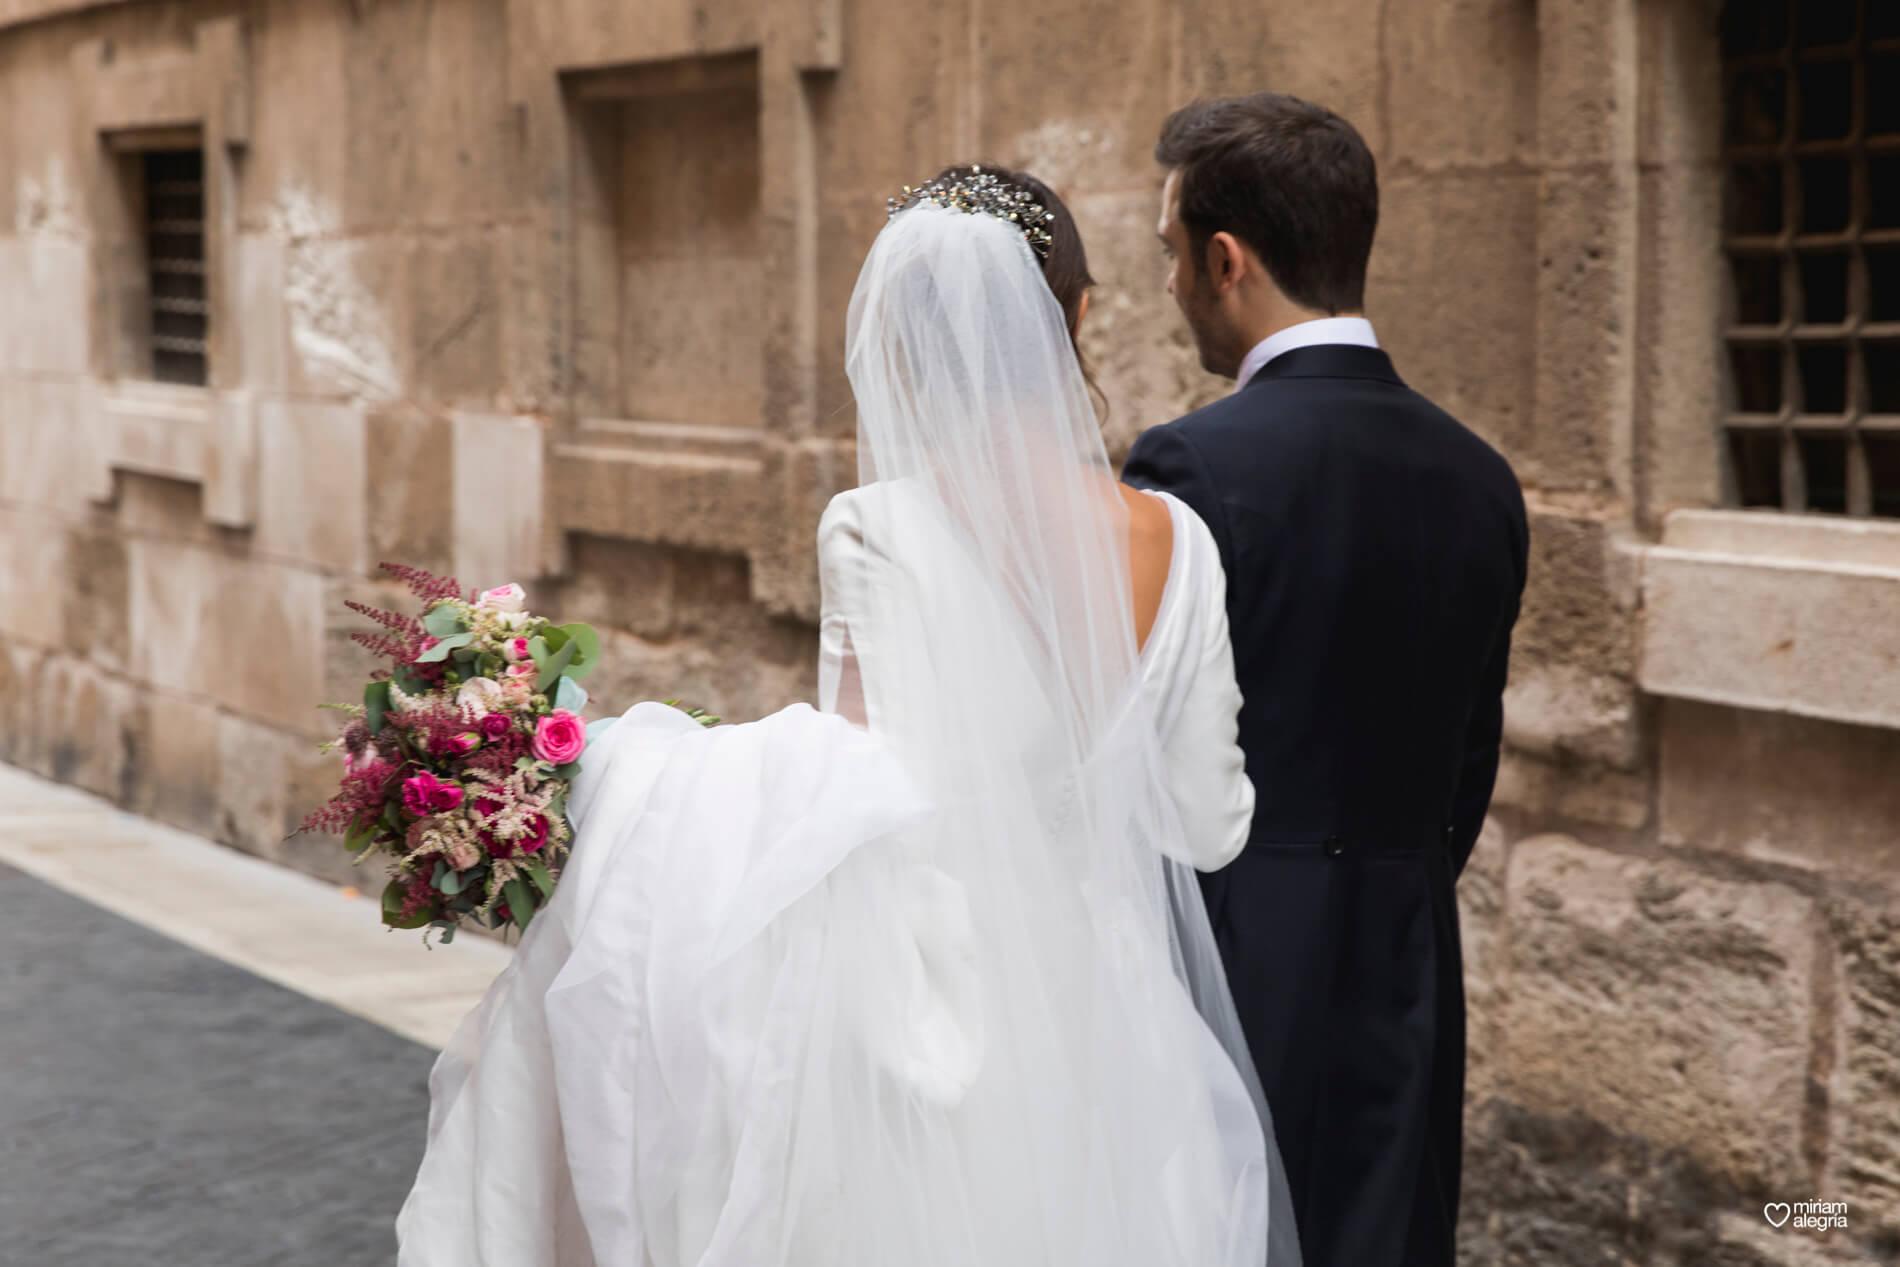 vestido-de-novia-paula-del-vas-miriam-alegria-fotografos-boda-murcia-84